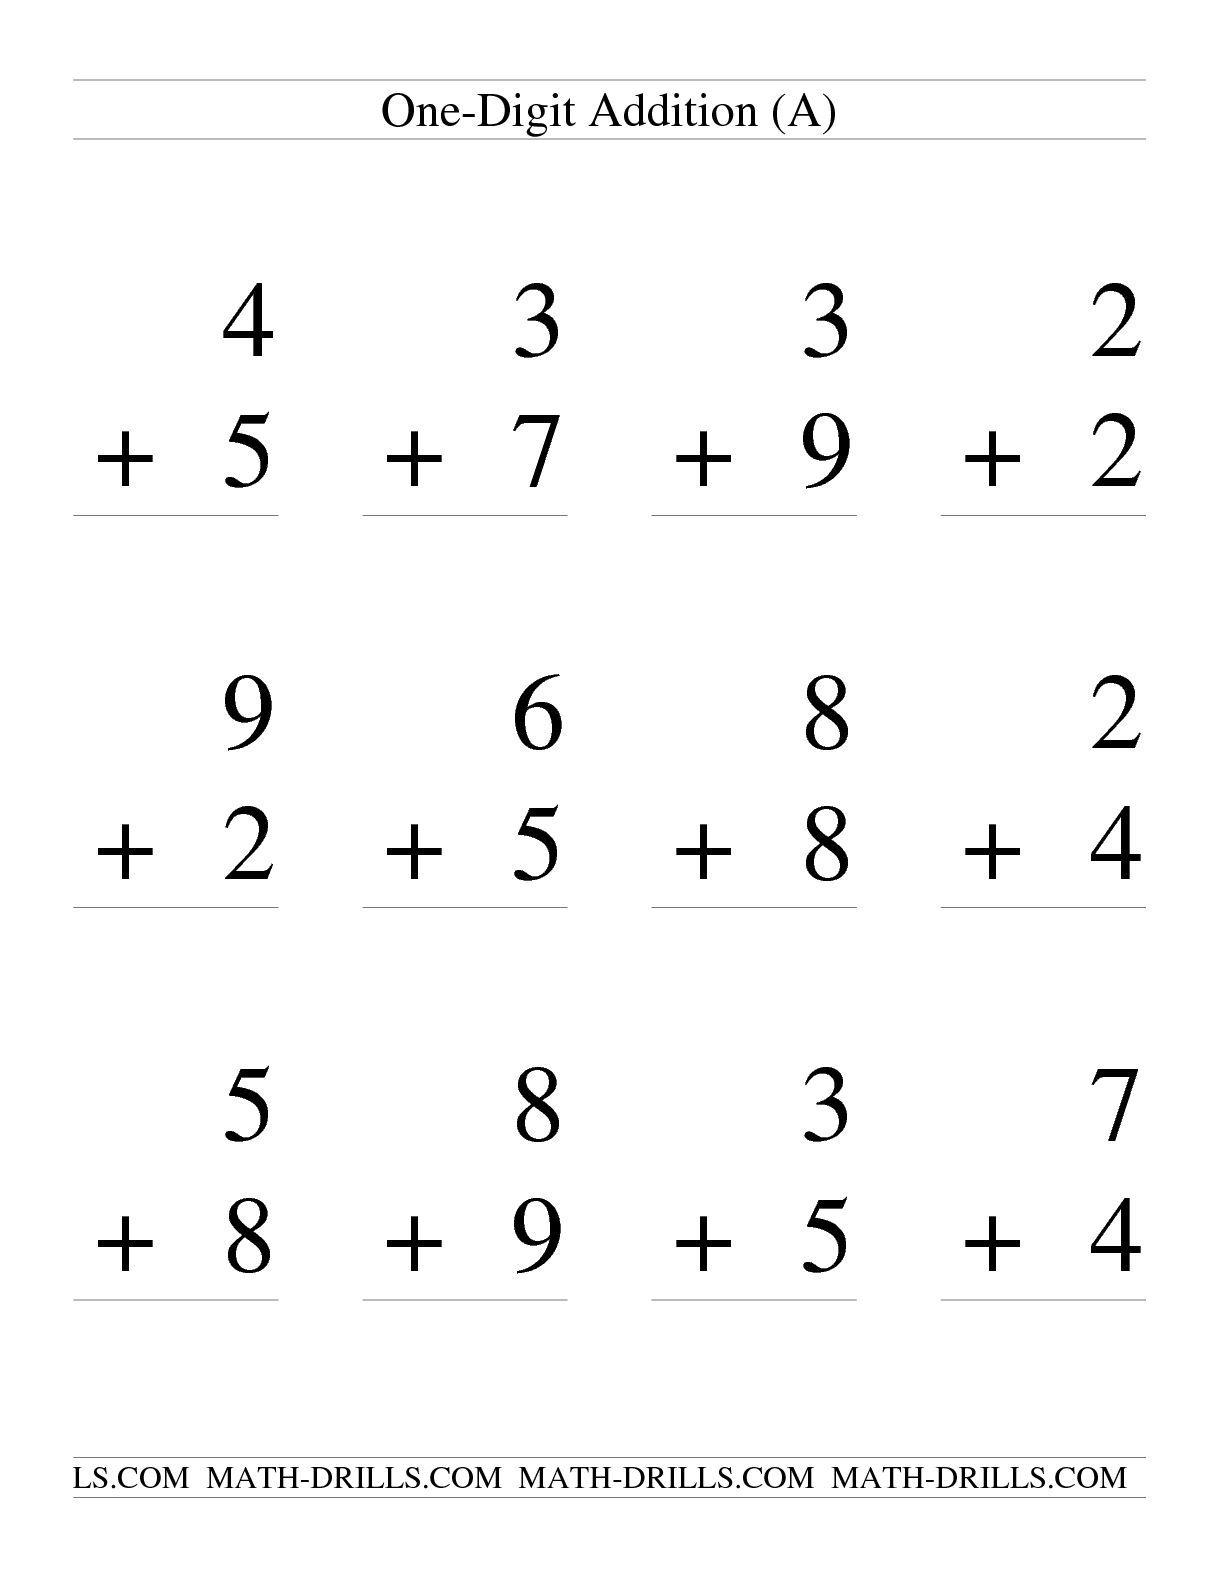 https://dubaikhalifas.com/single-digit-addition-worksheets-for-first-grade/ [ 400 x 1584 Pixel ]